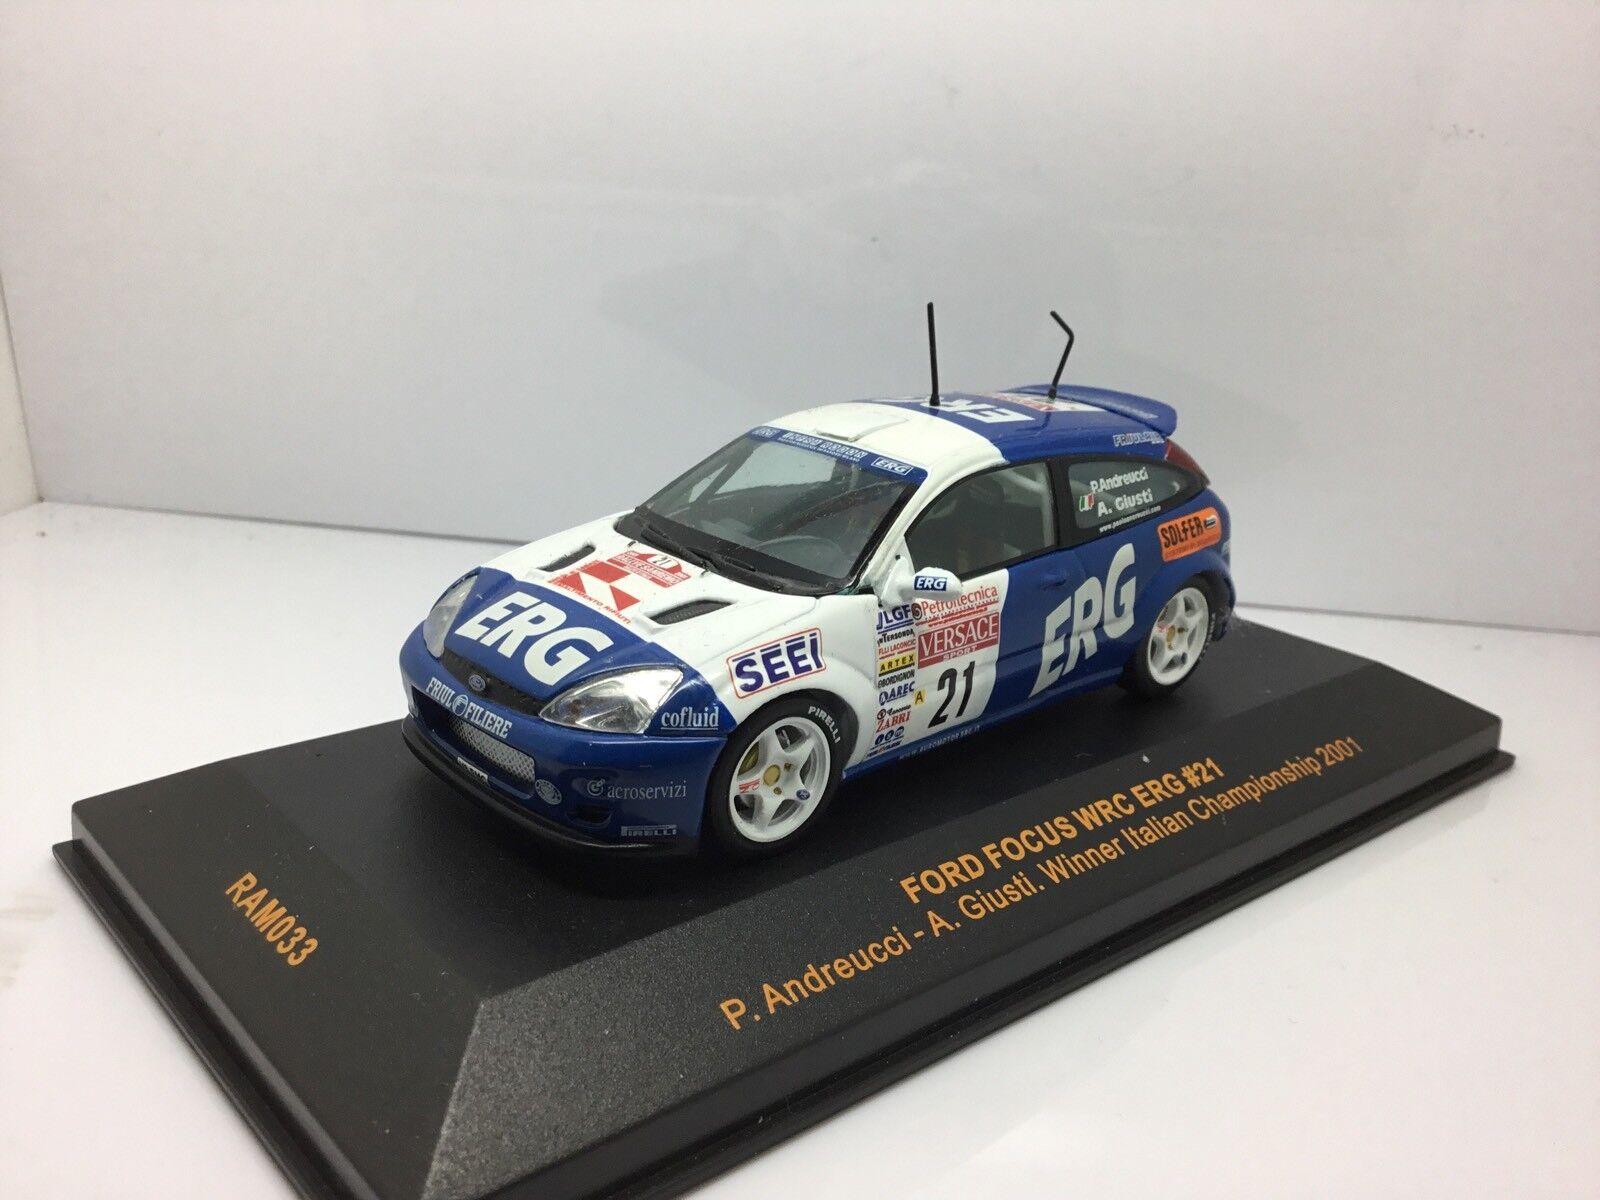 IXO FORD FOCUS WRC ERG WINNER ITALIAN CHAMPIONSHIP 2001 RAM033 1 43